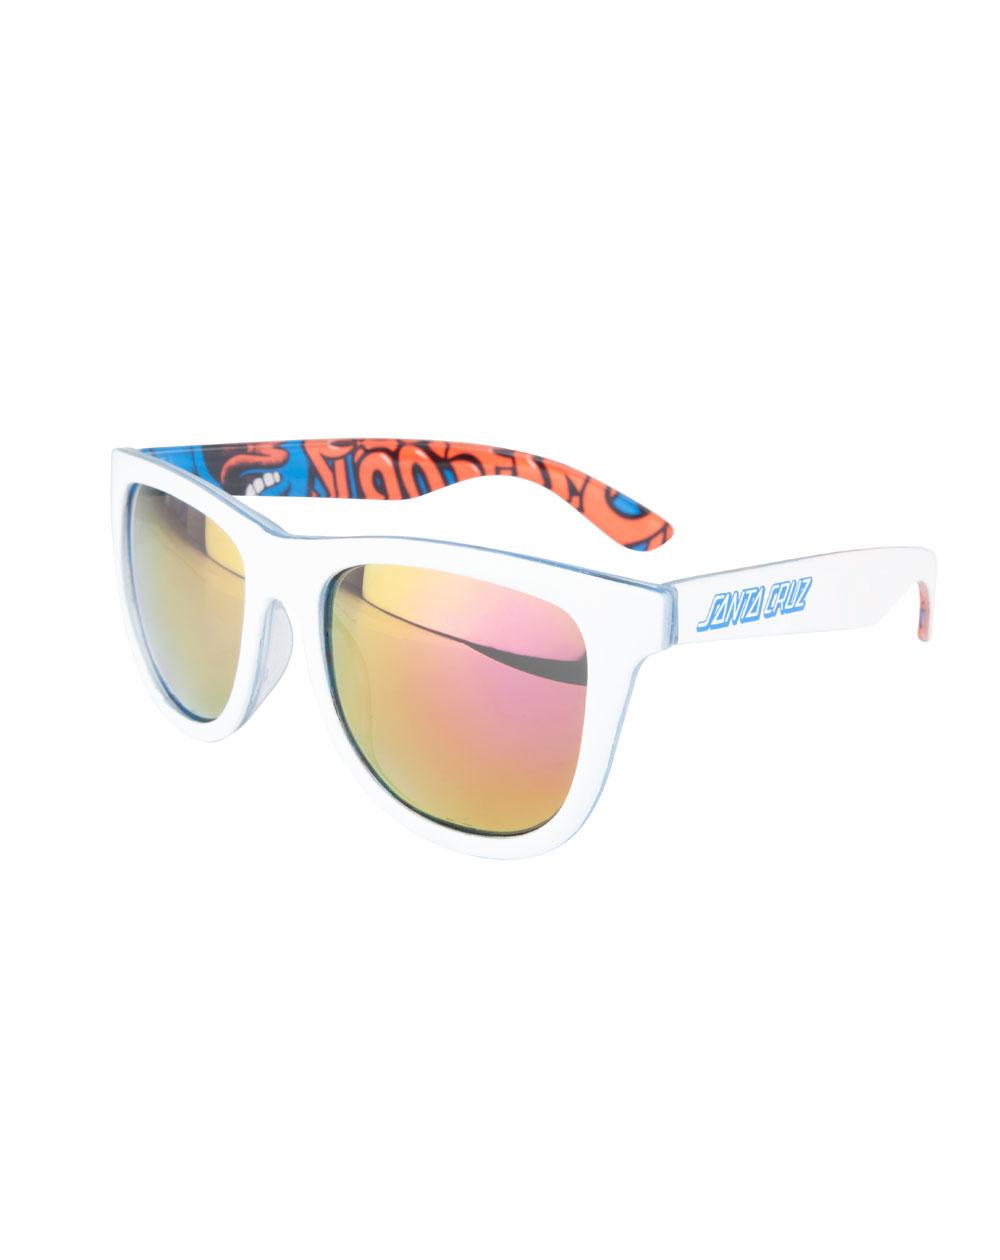 Santa Cruz Herren Sonnenbrillen Screaming Insider White/Blue